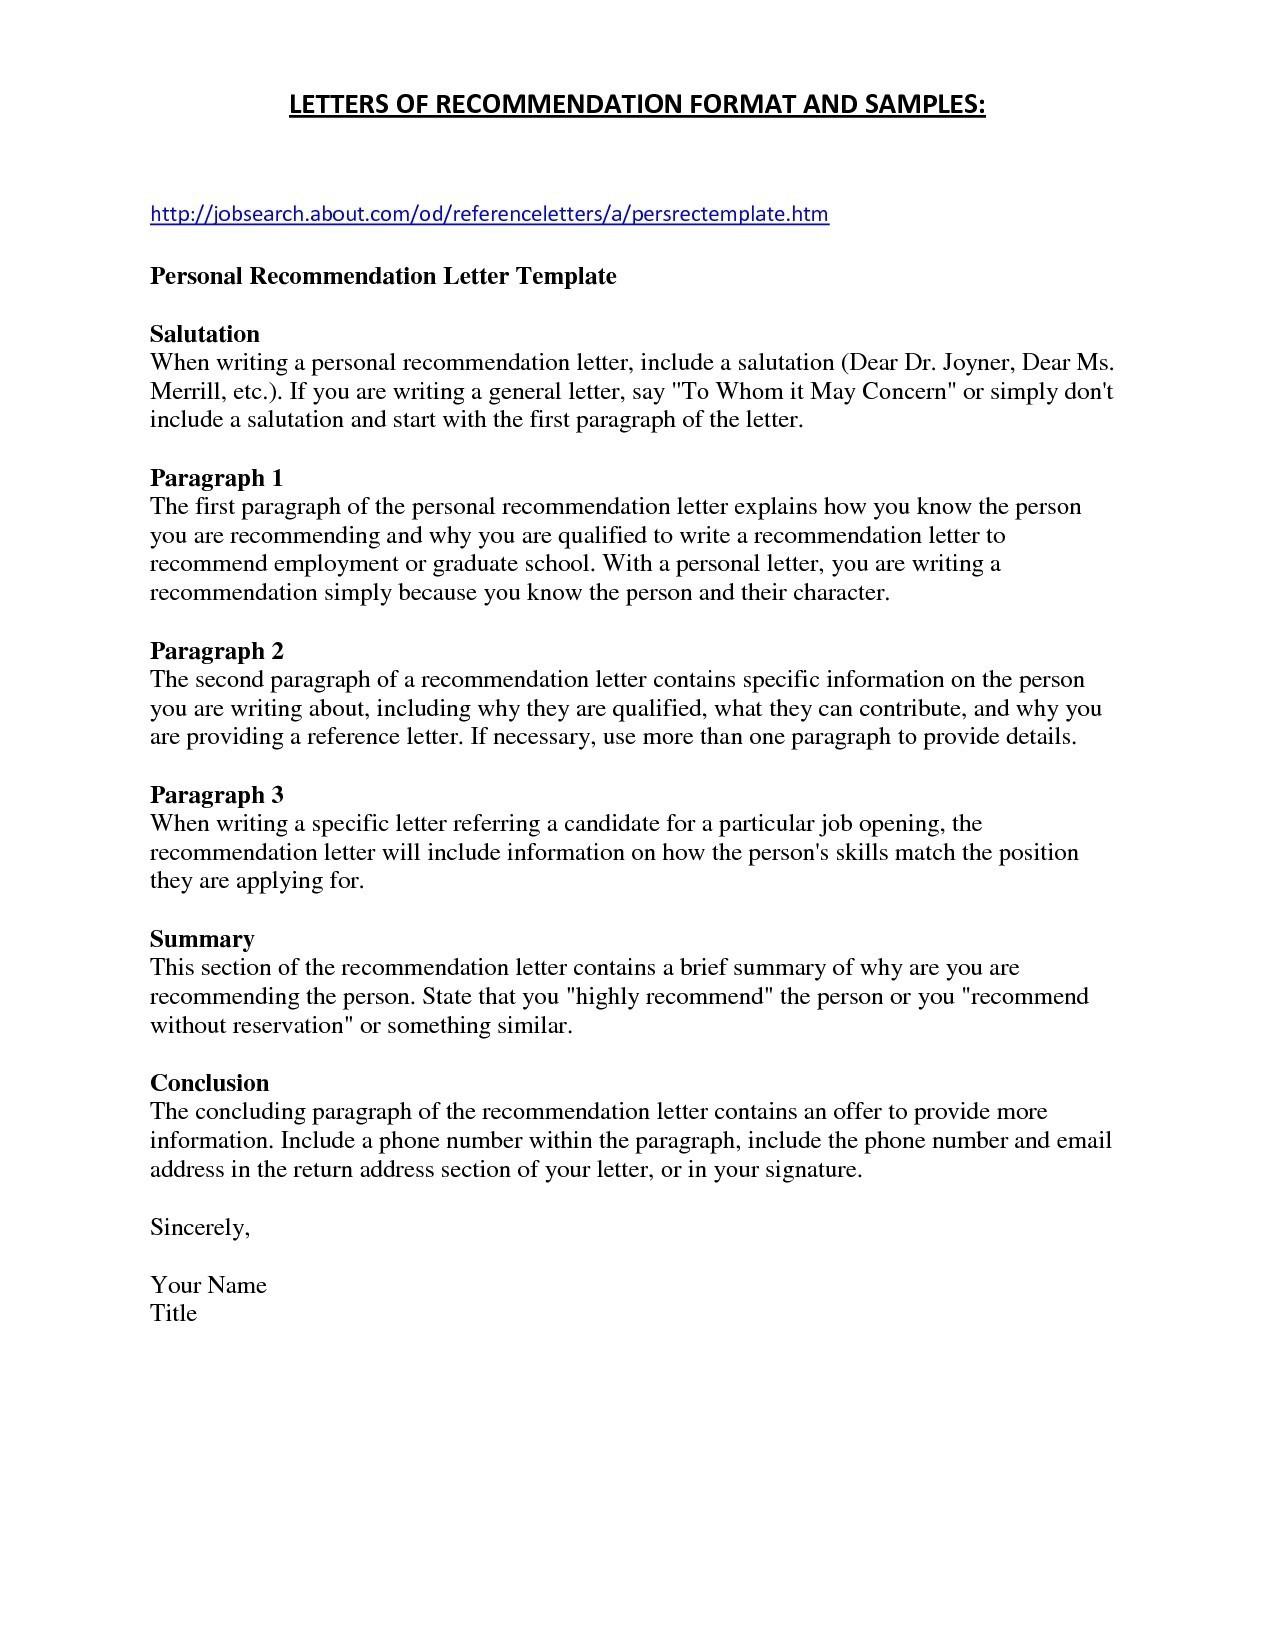 next of kin letter template Collection-Format plaint Letter Consumer Court New Formal Plaint Letter regarding plaint Letter Uk 17-j